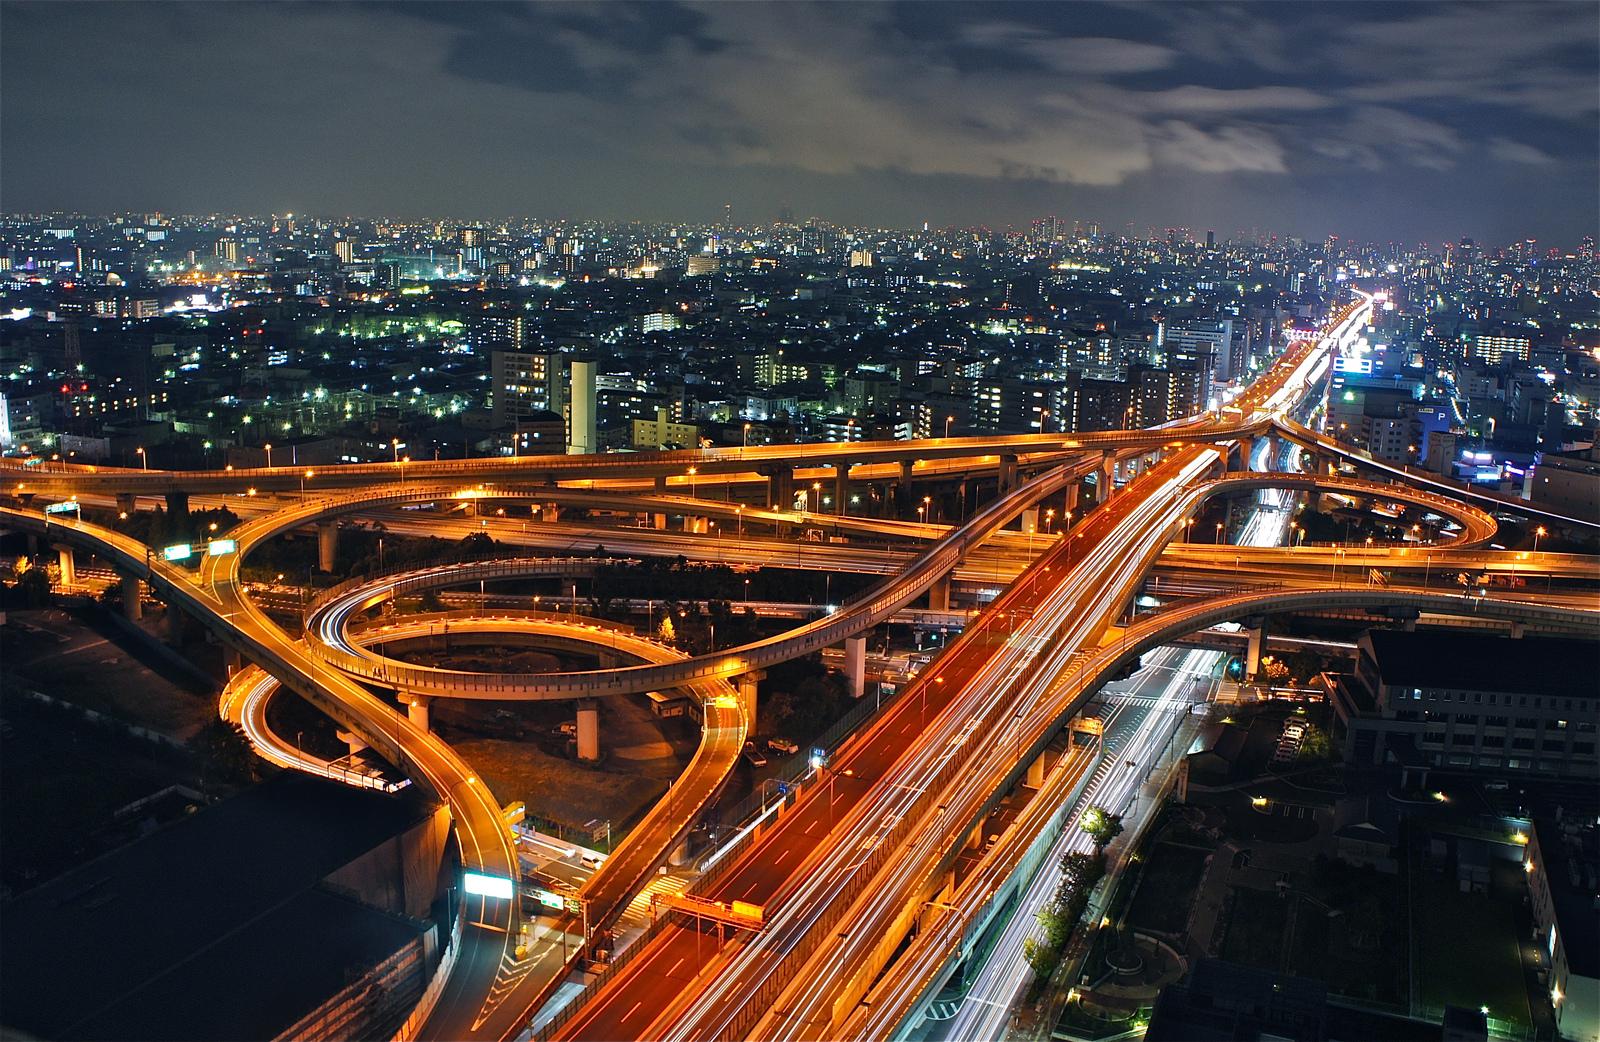 Hakozaki Junction : A complex web of highway construction